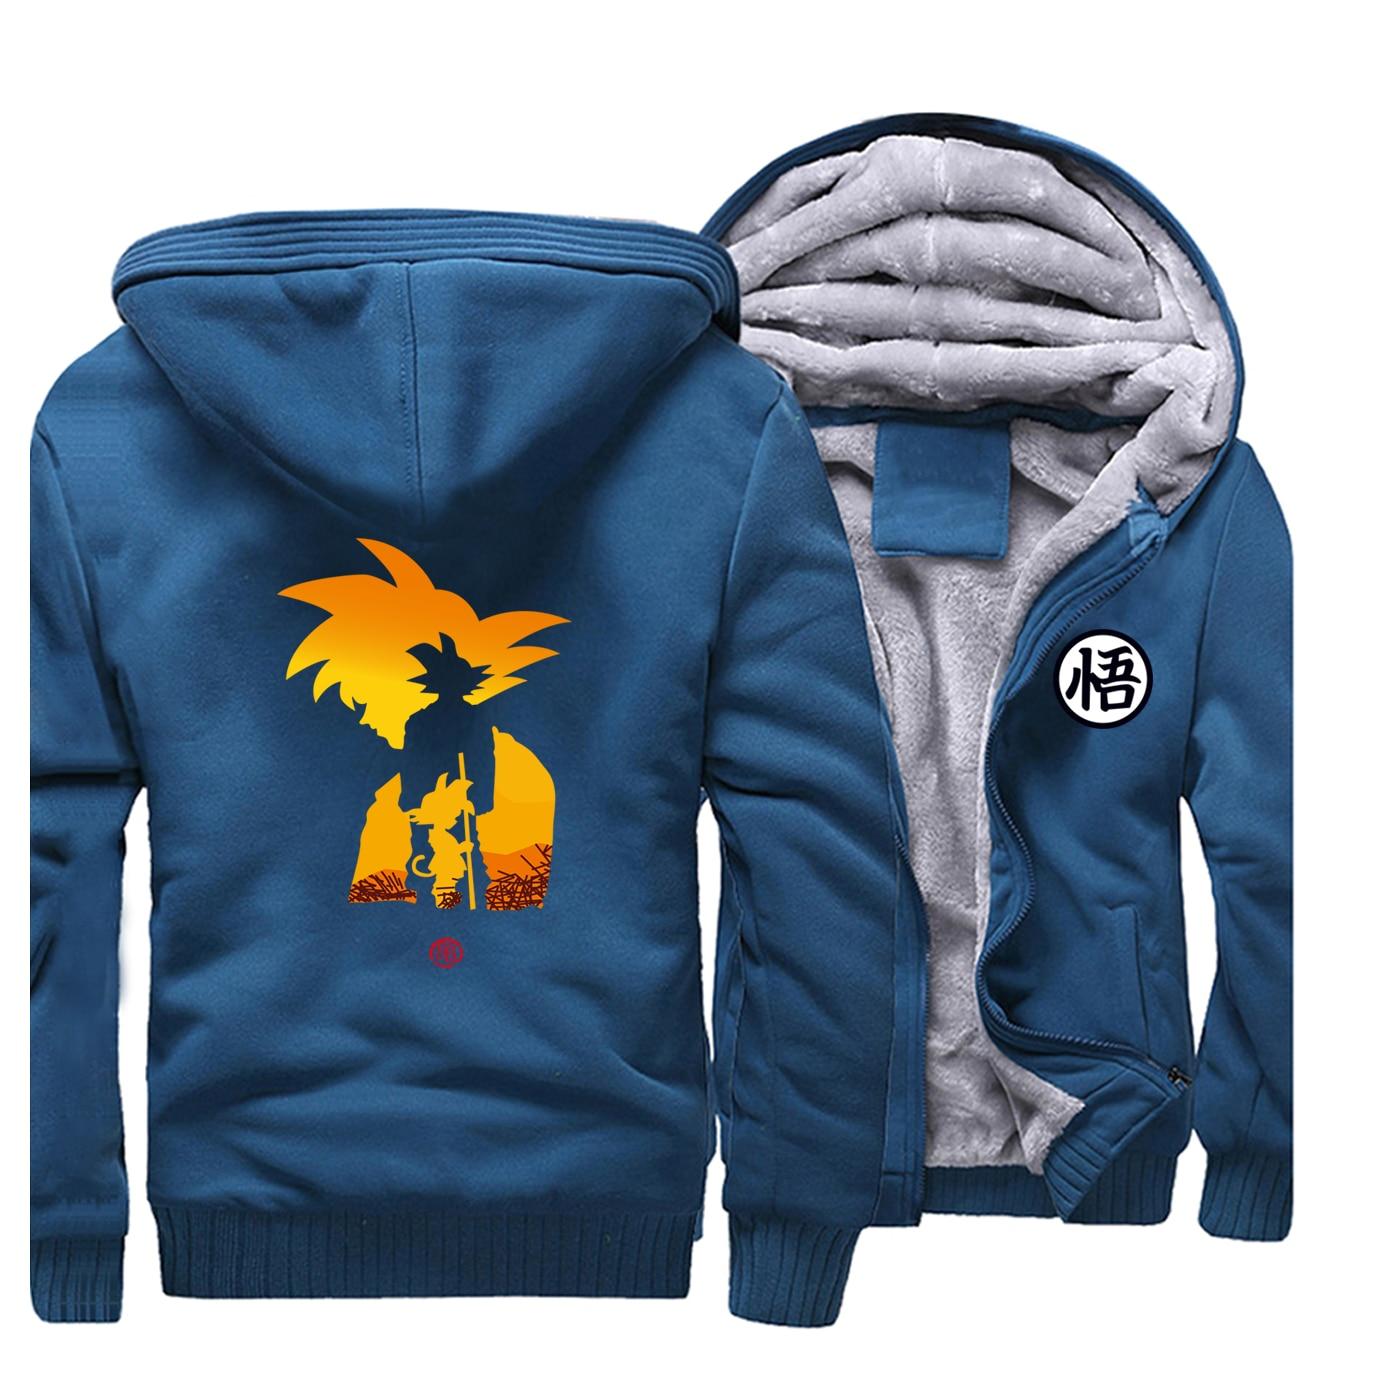 Mens Thicken Hoodies Raglan Dragon Ball Z Goku Sweatshirt Winter Warm Coat DragonBall Z Harajuku clothing Japan Anime Men Hoodie